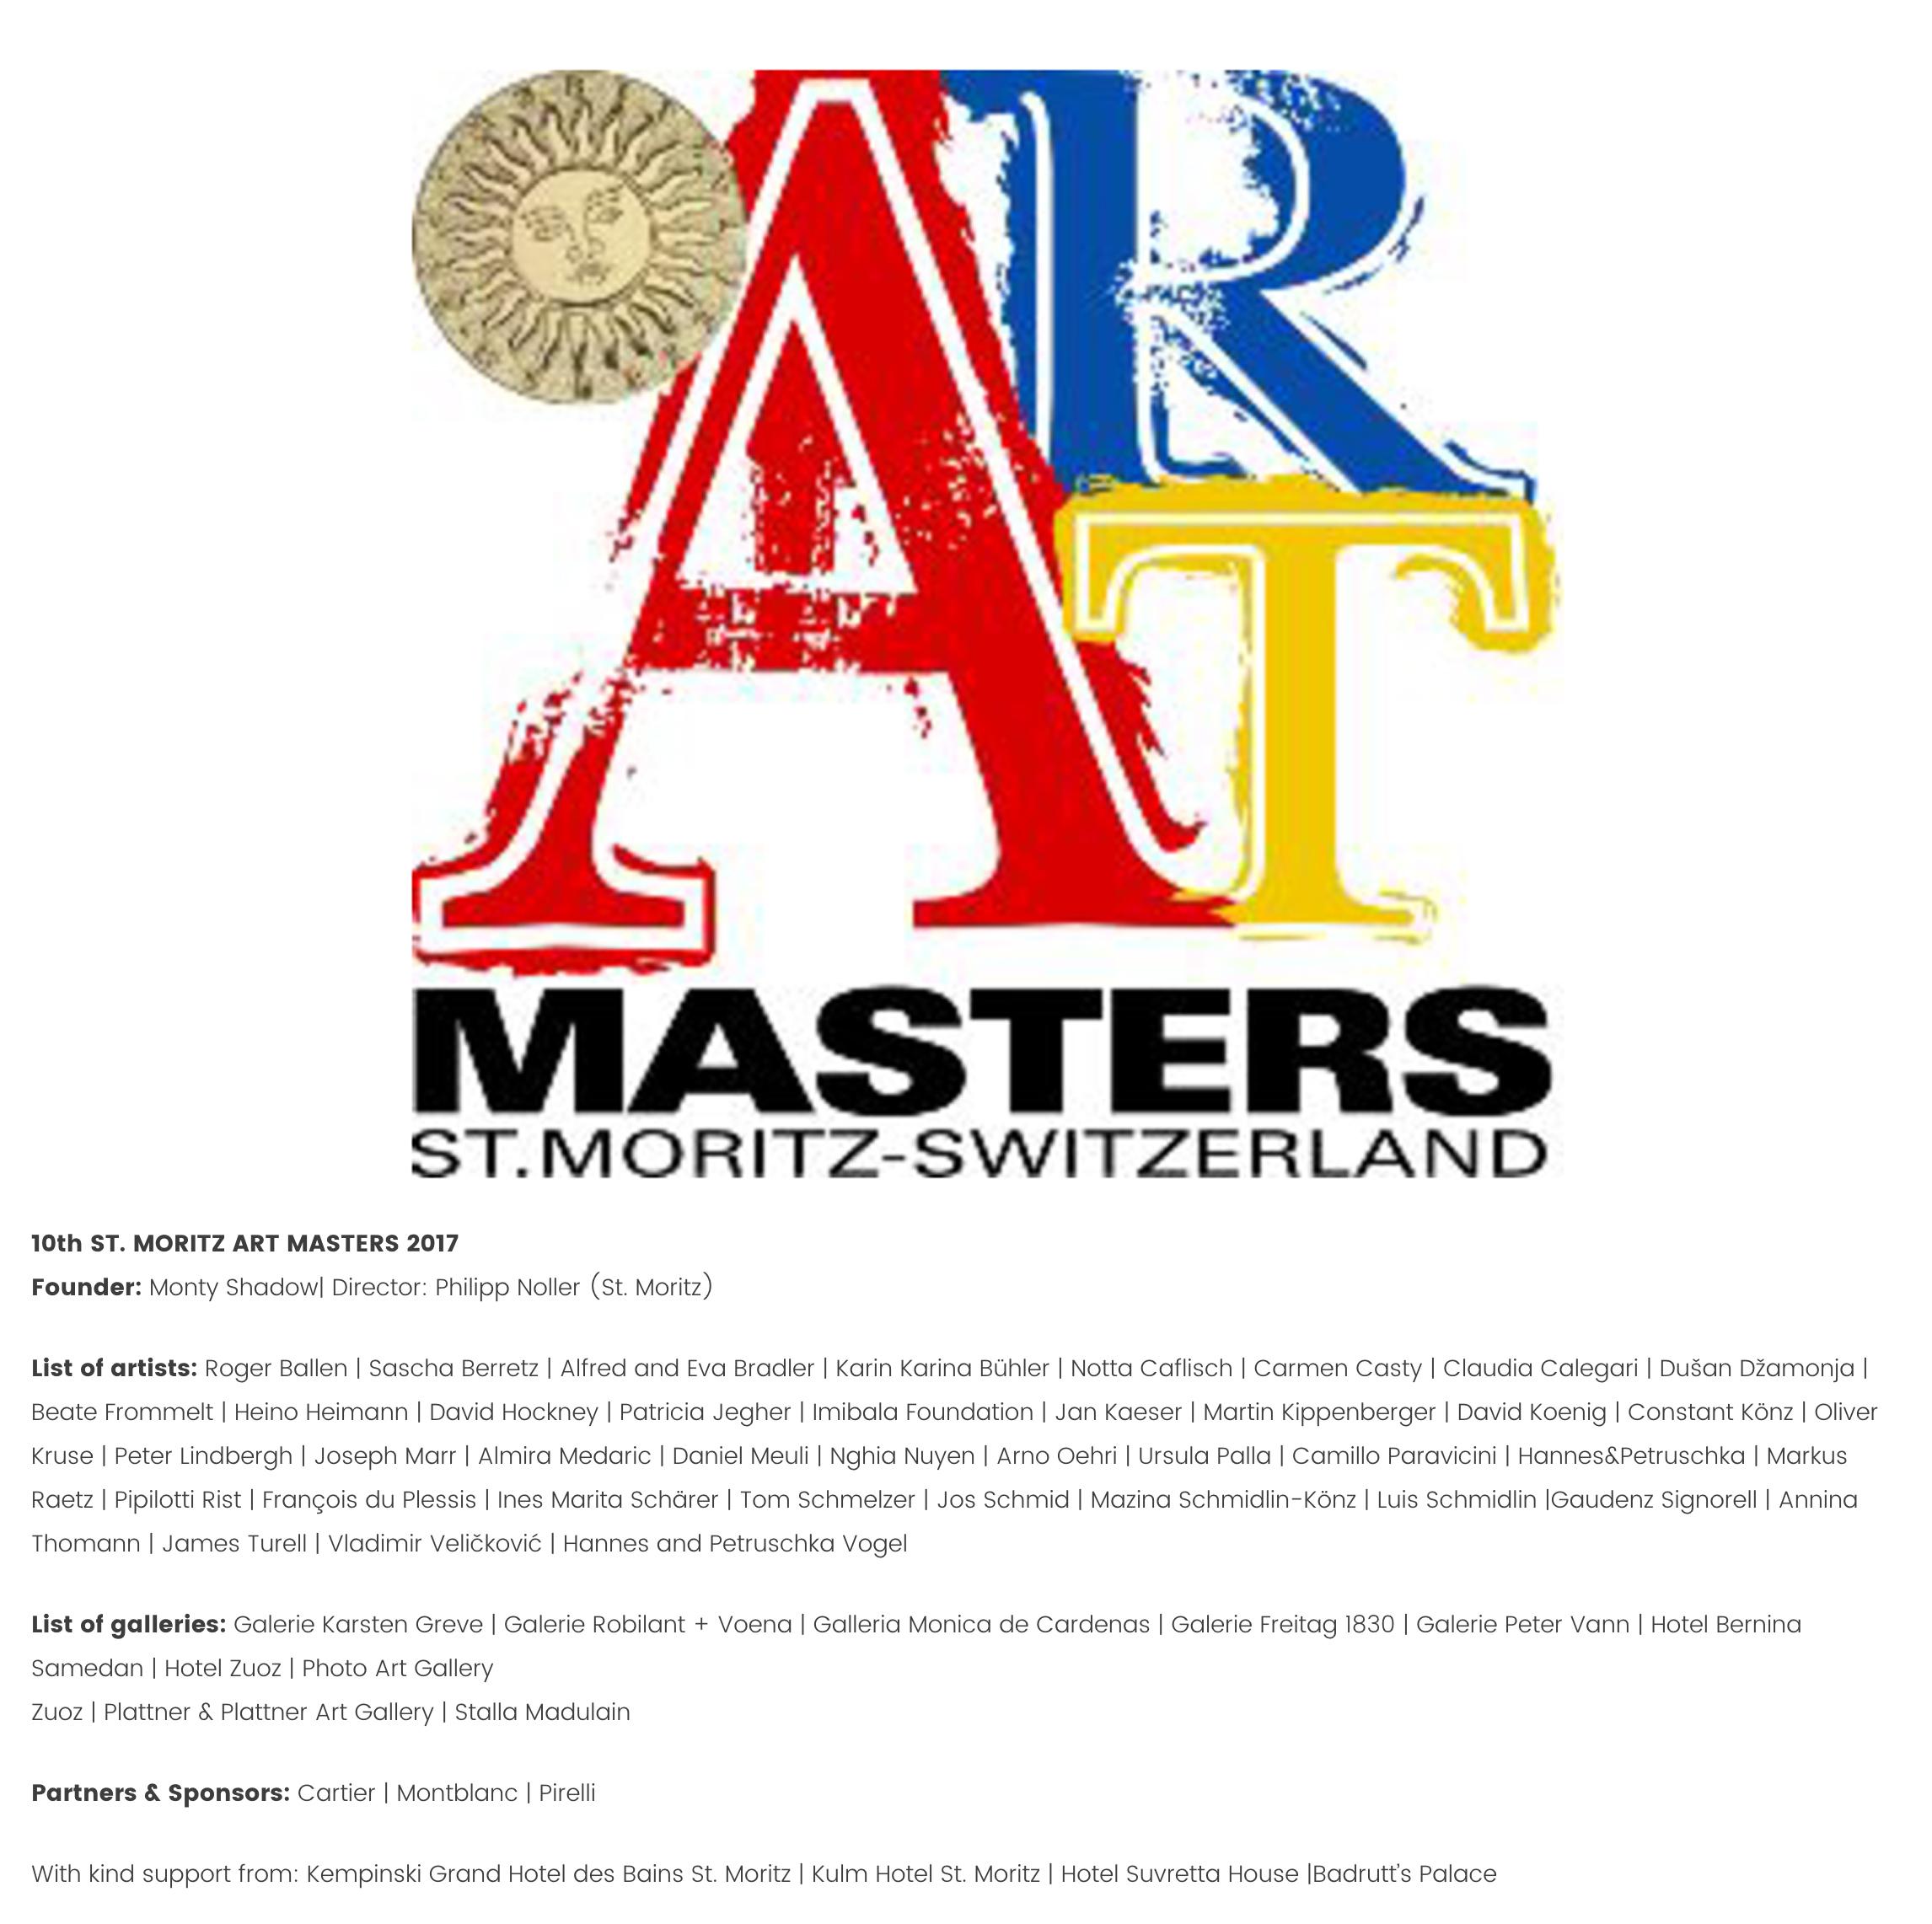 St Moritz Art Masters 2017